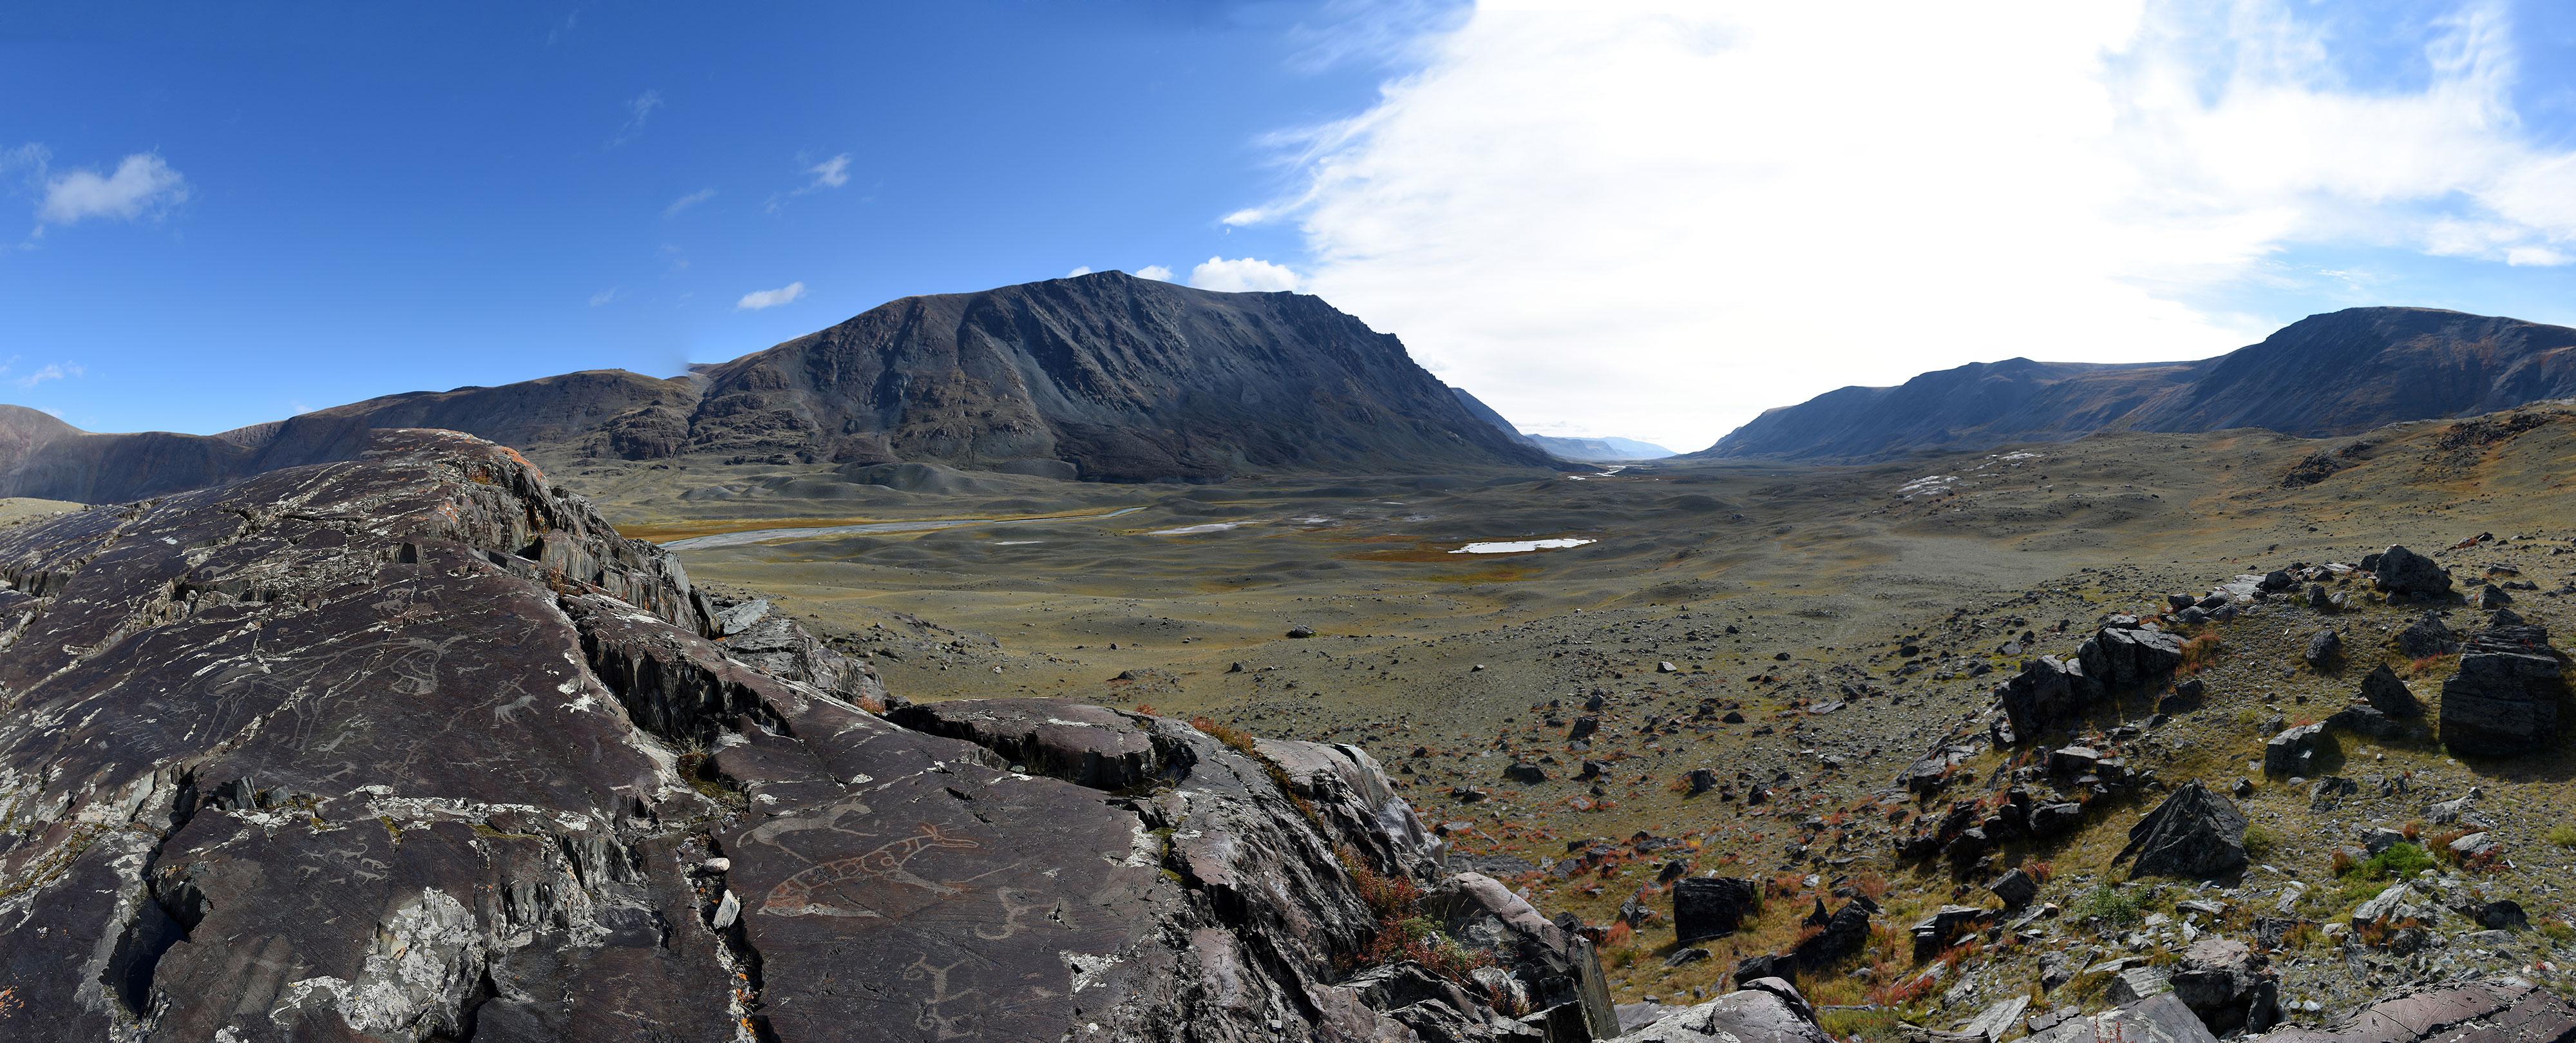 Exterior 69174355 furthermore Khoton Khurgan Nuur Mongolia together with Gotcha together with Tanzania Photos further Faune Alpine. on alpine navigation